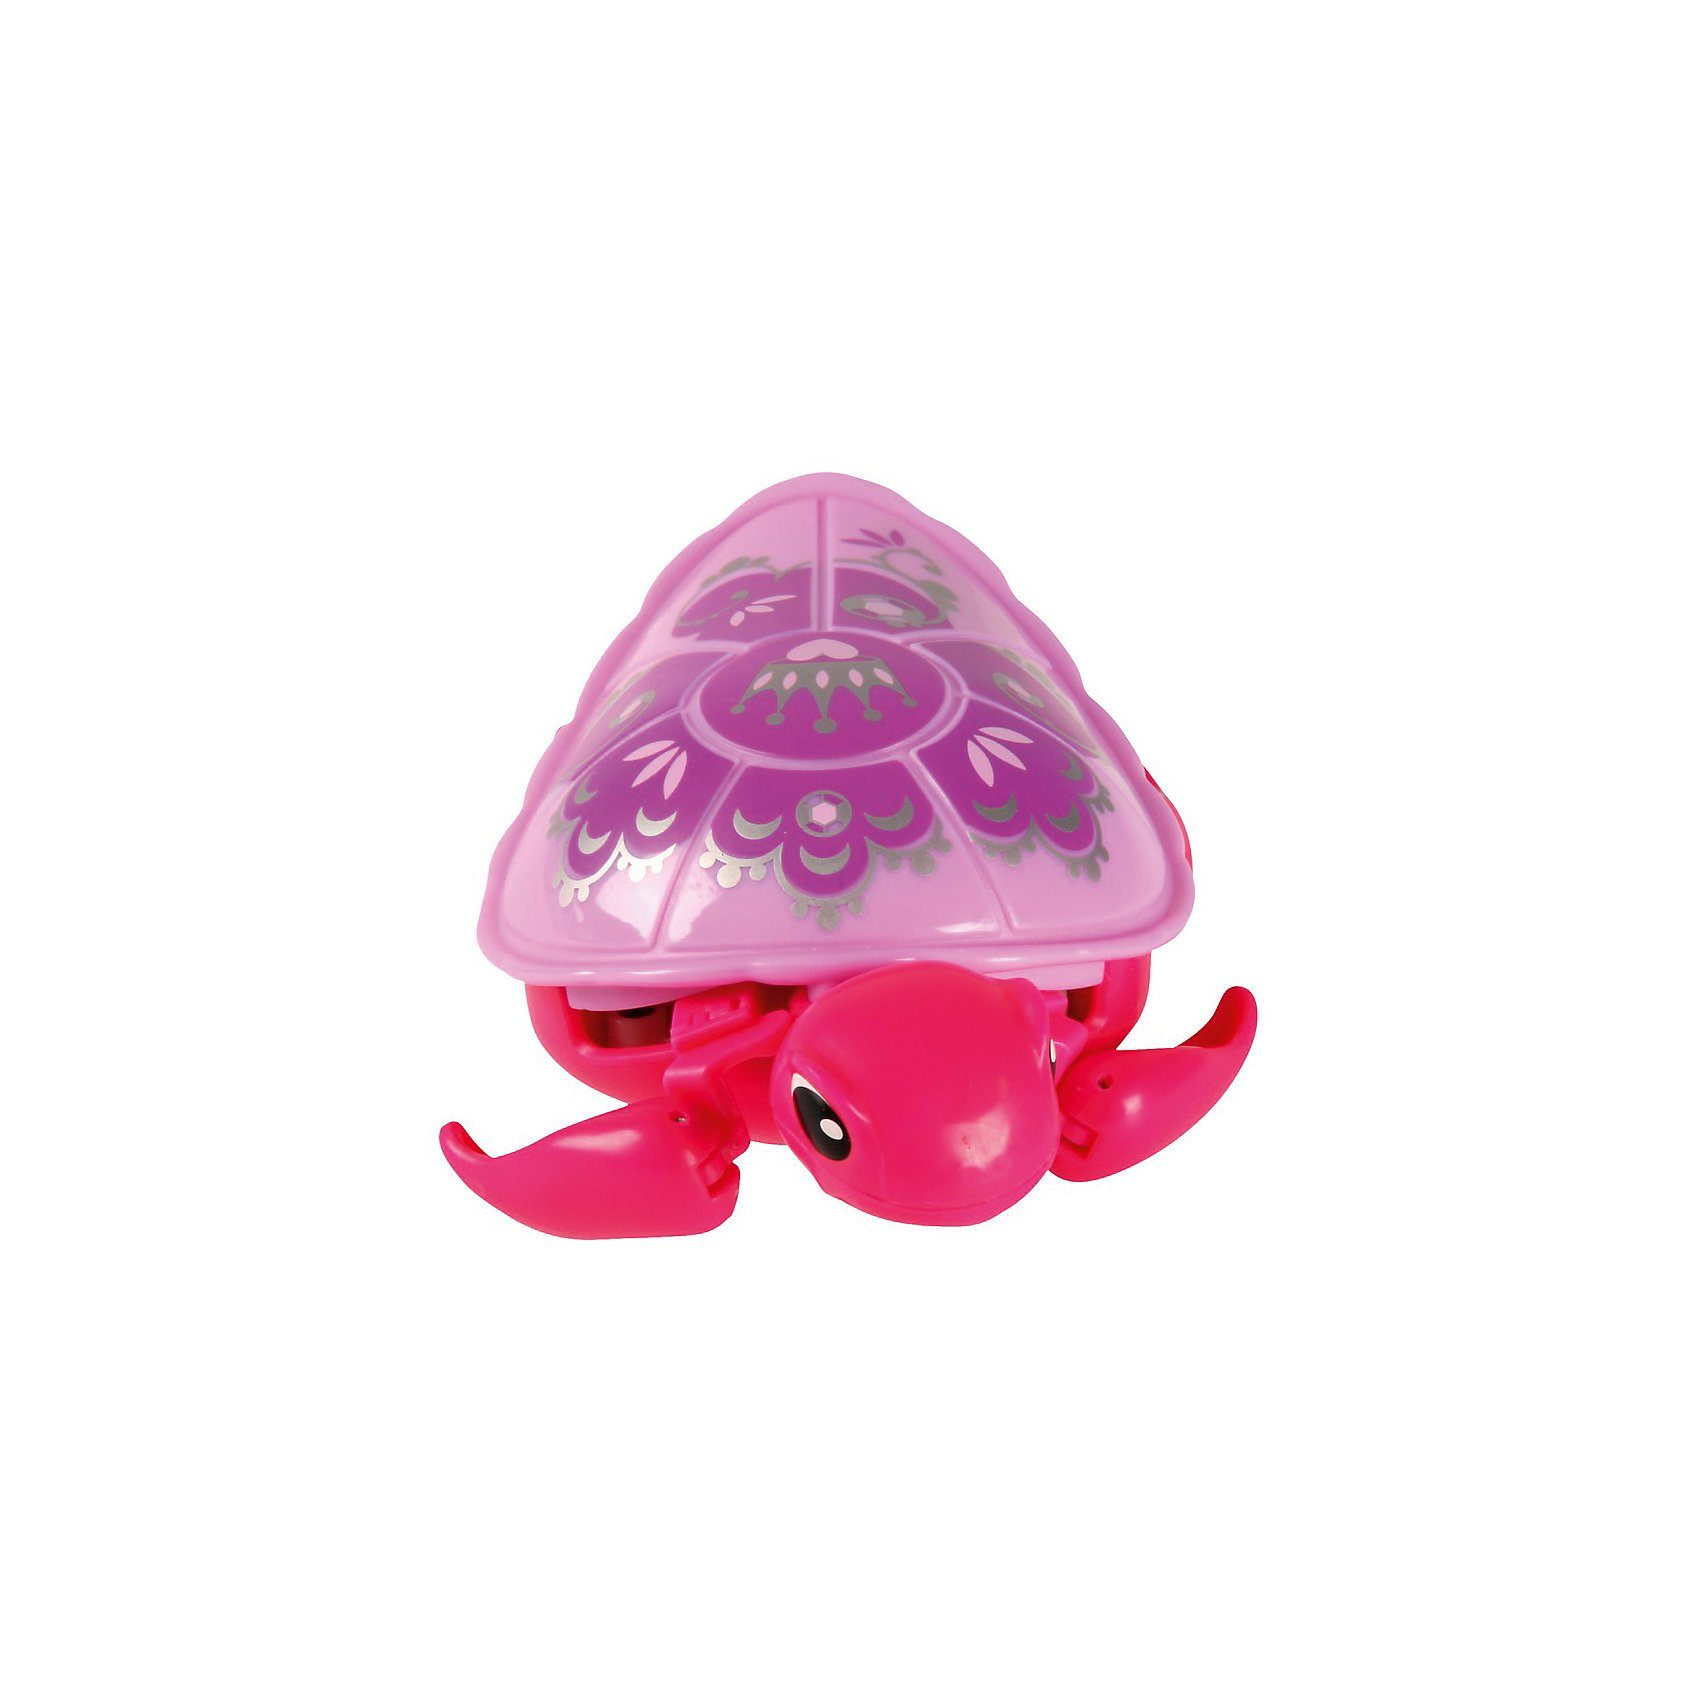 BOTI Little Live Pets Schildkröte Princess rosa/lila